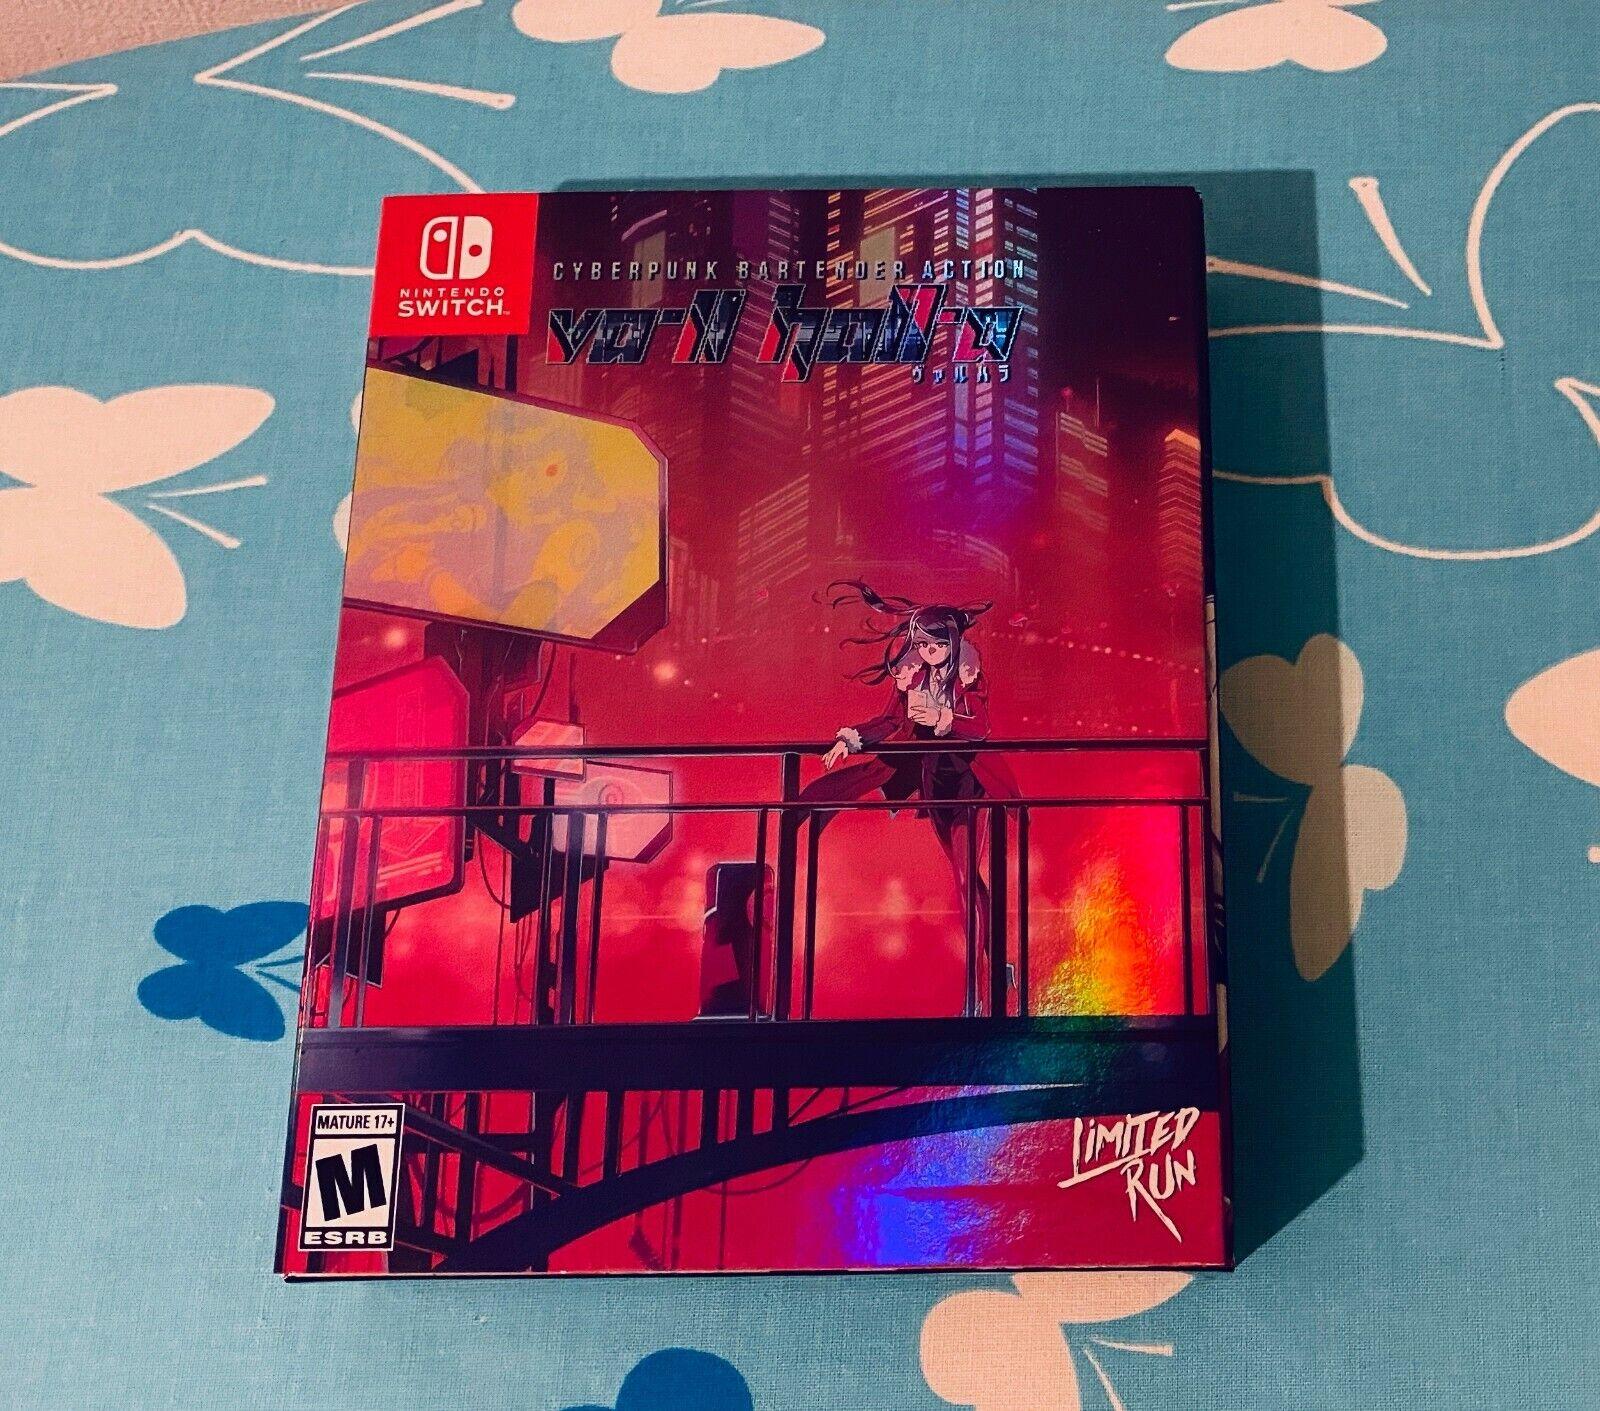 VA-11 HALL-A Nintendo Switch Collectors Edition Limited Run Games neuw.